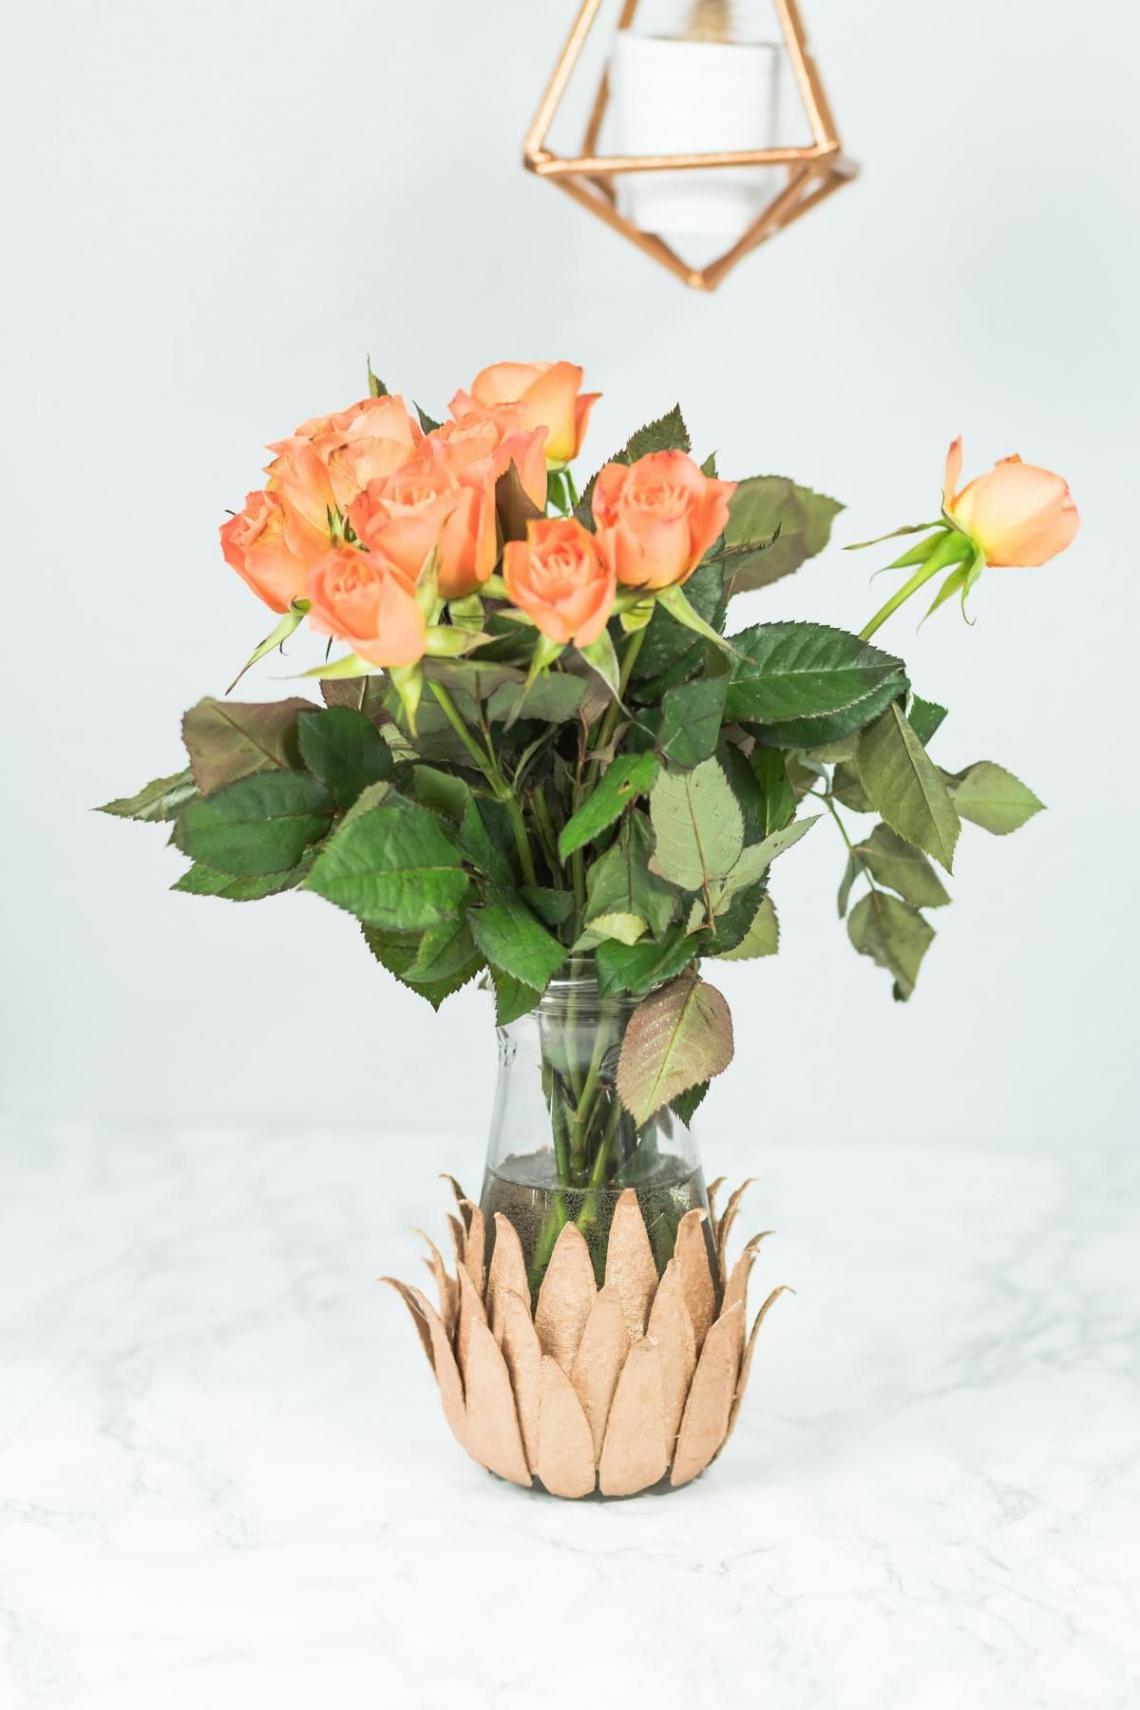 diy vase basteln schone zimmer deko idee in kupfer vase selber machen vase selber machen